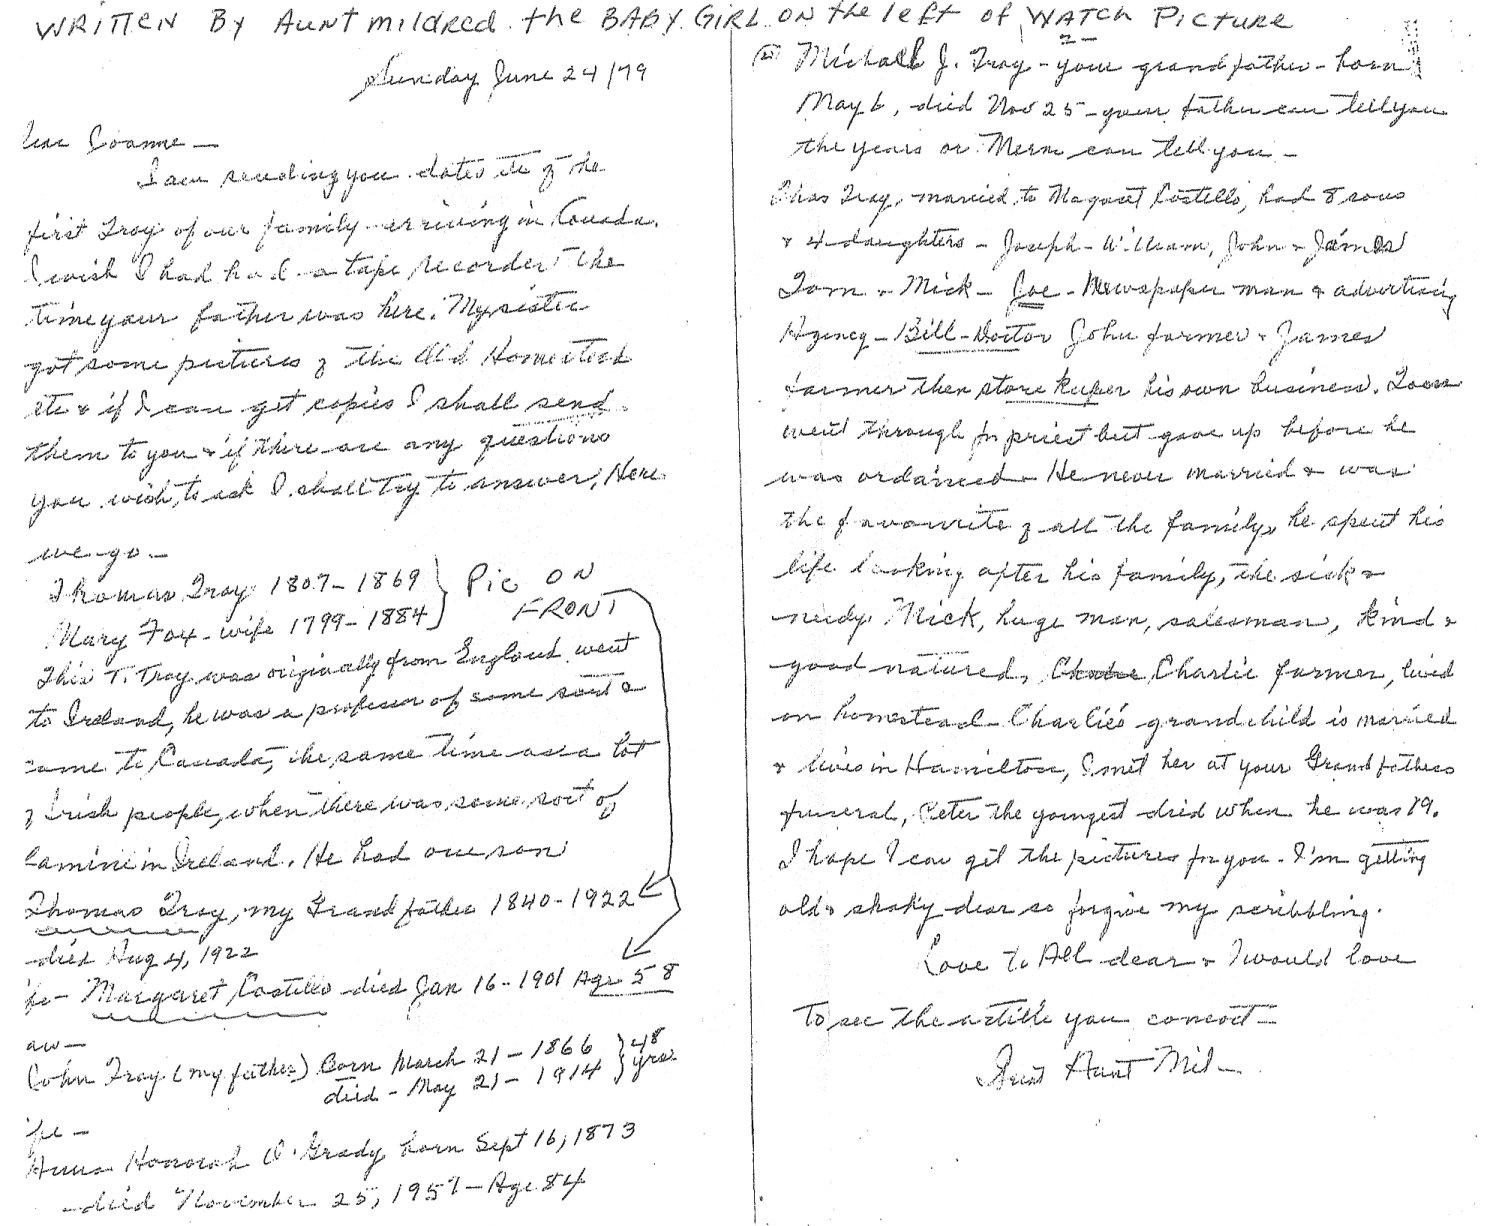 Troy Family Letter, Nepean Township, Ottawa, Ontario, Canada